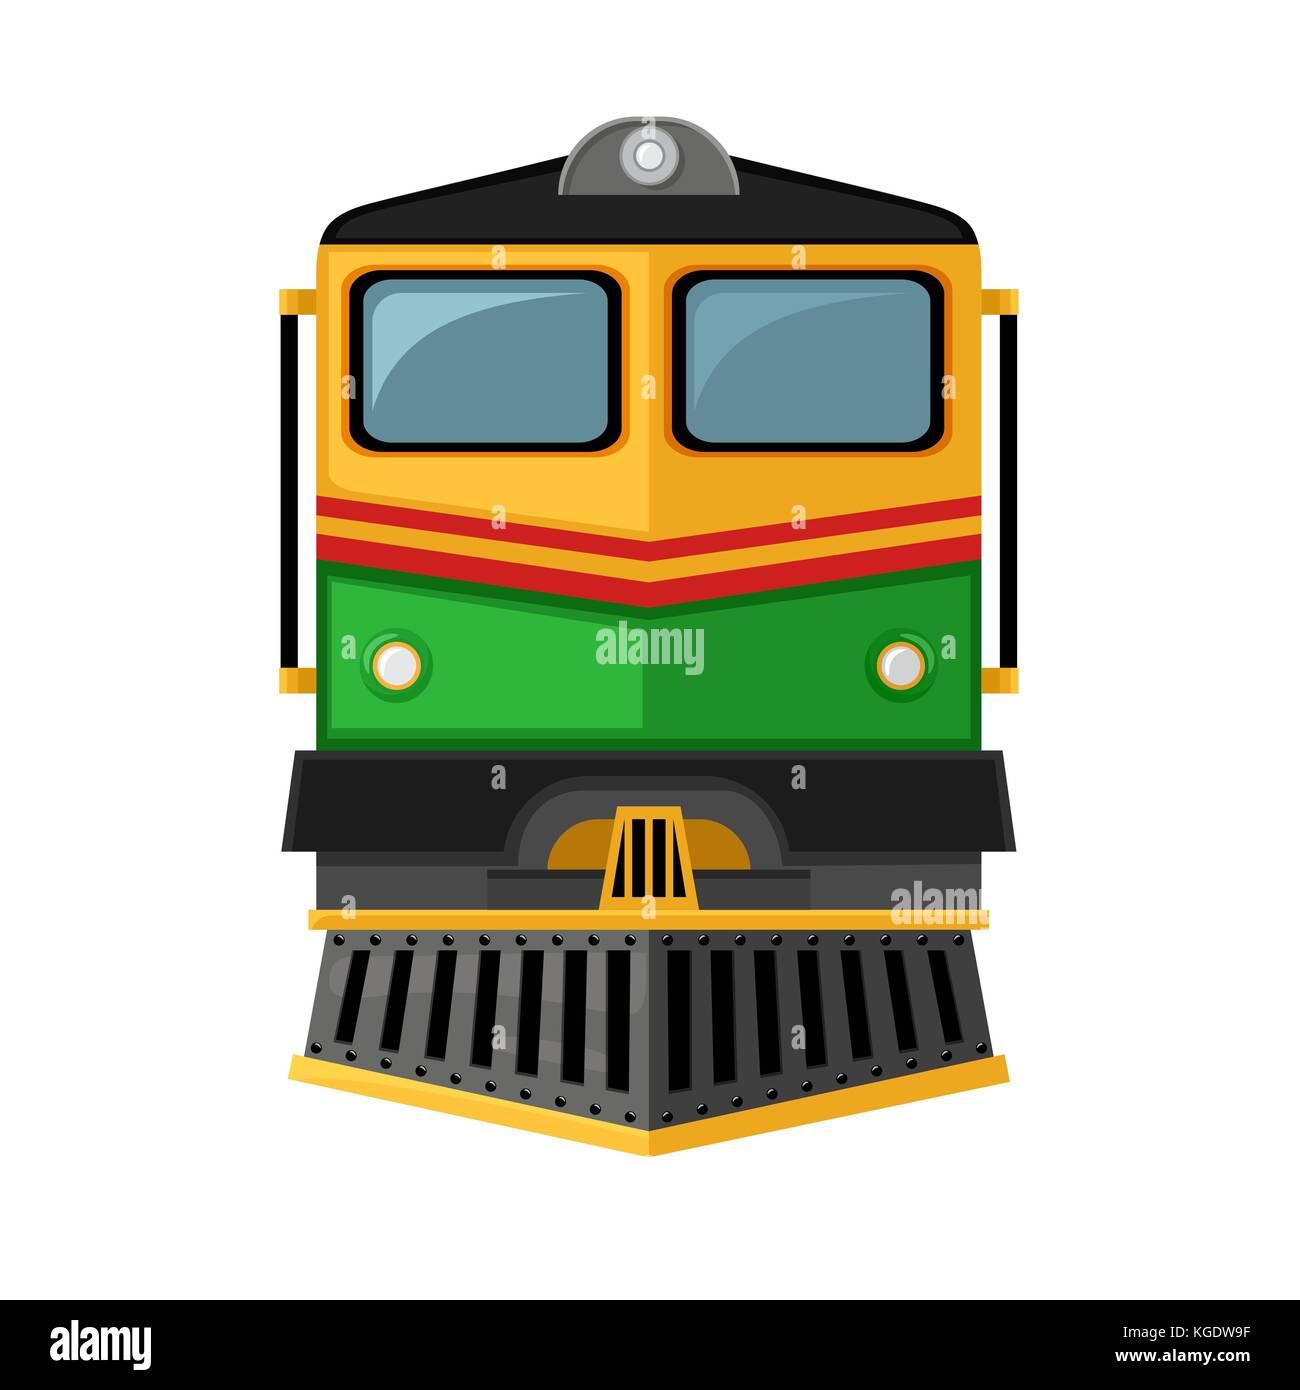 Railway Train Illustration Side View Stock Photos ...